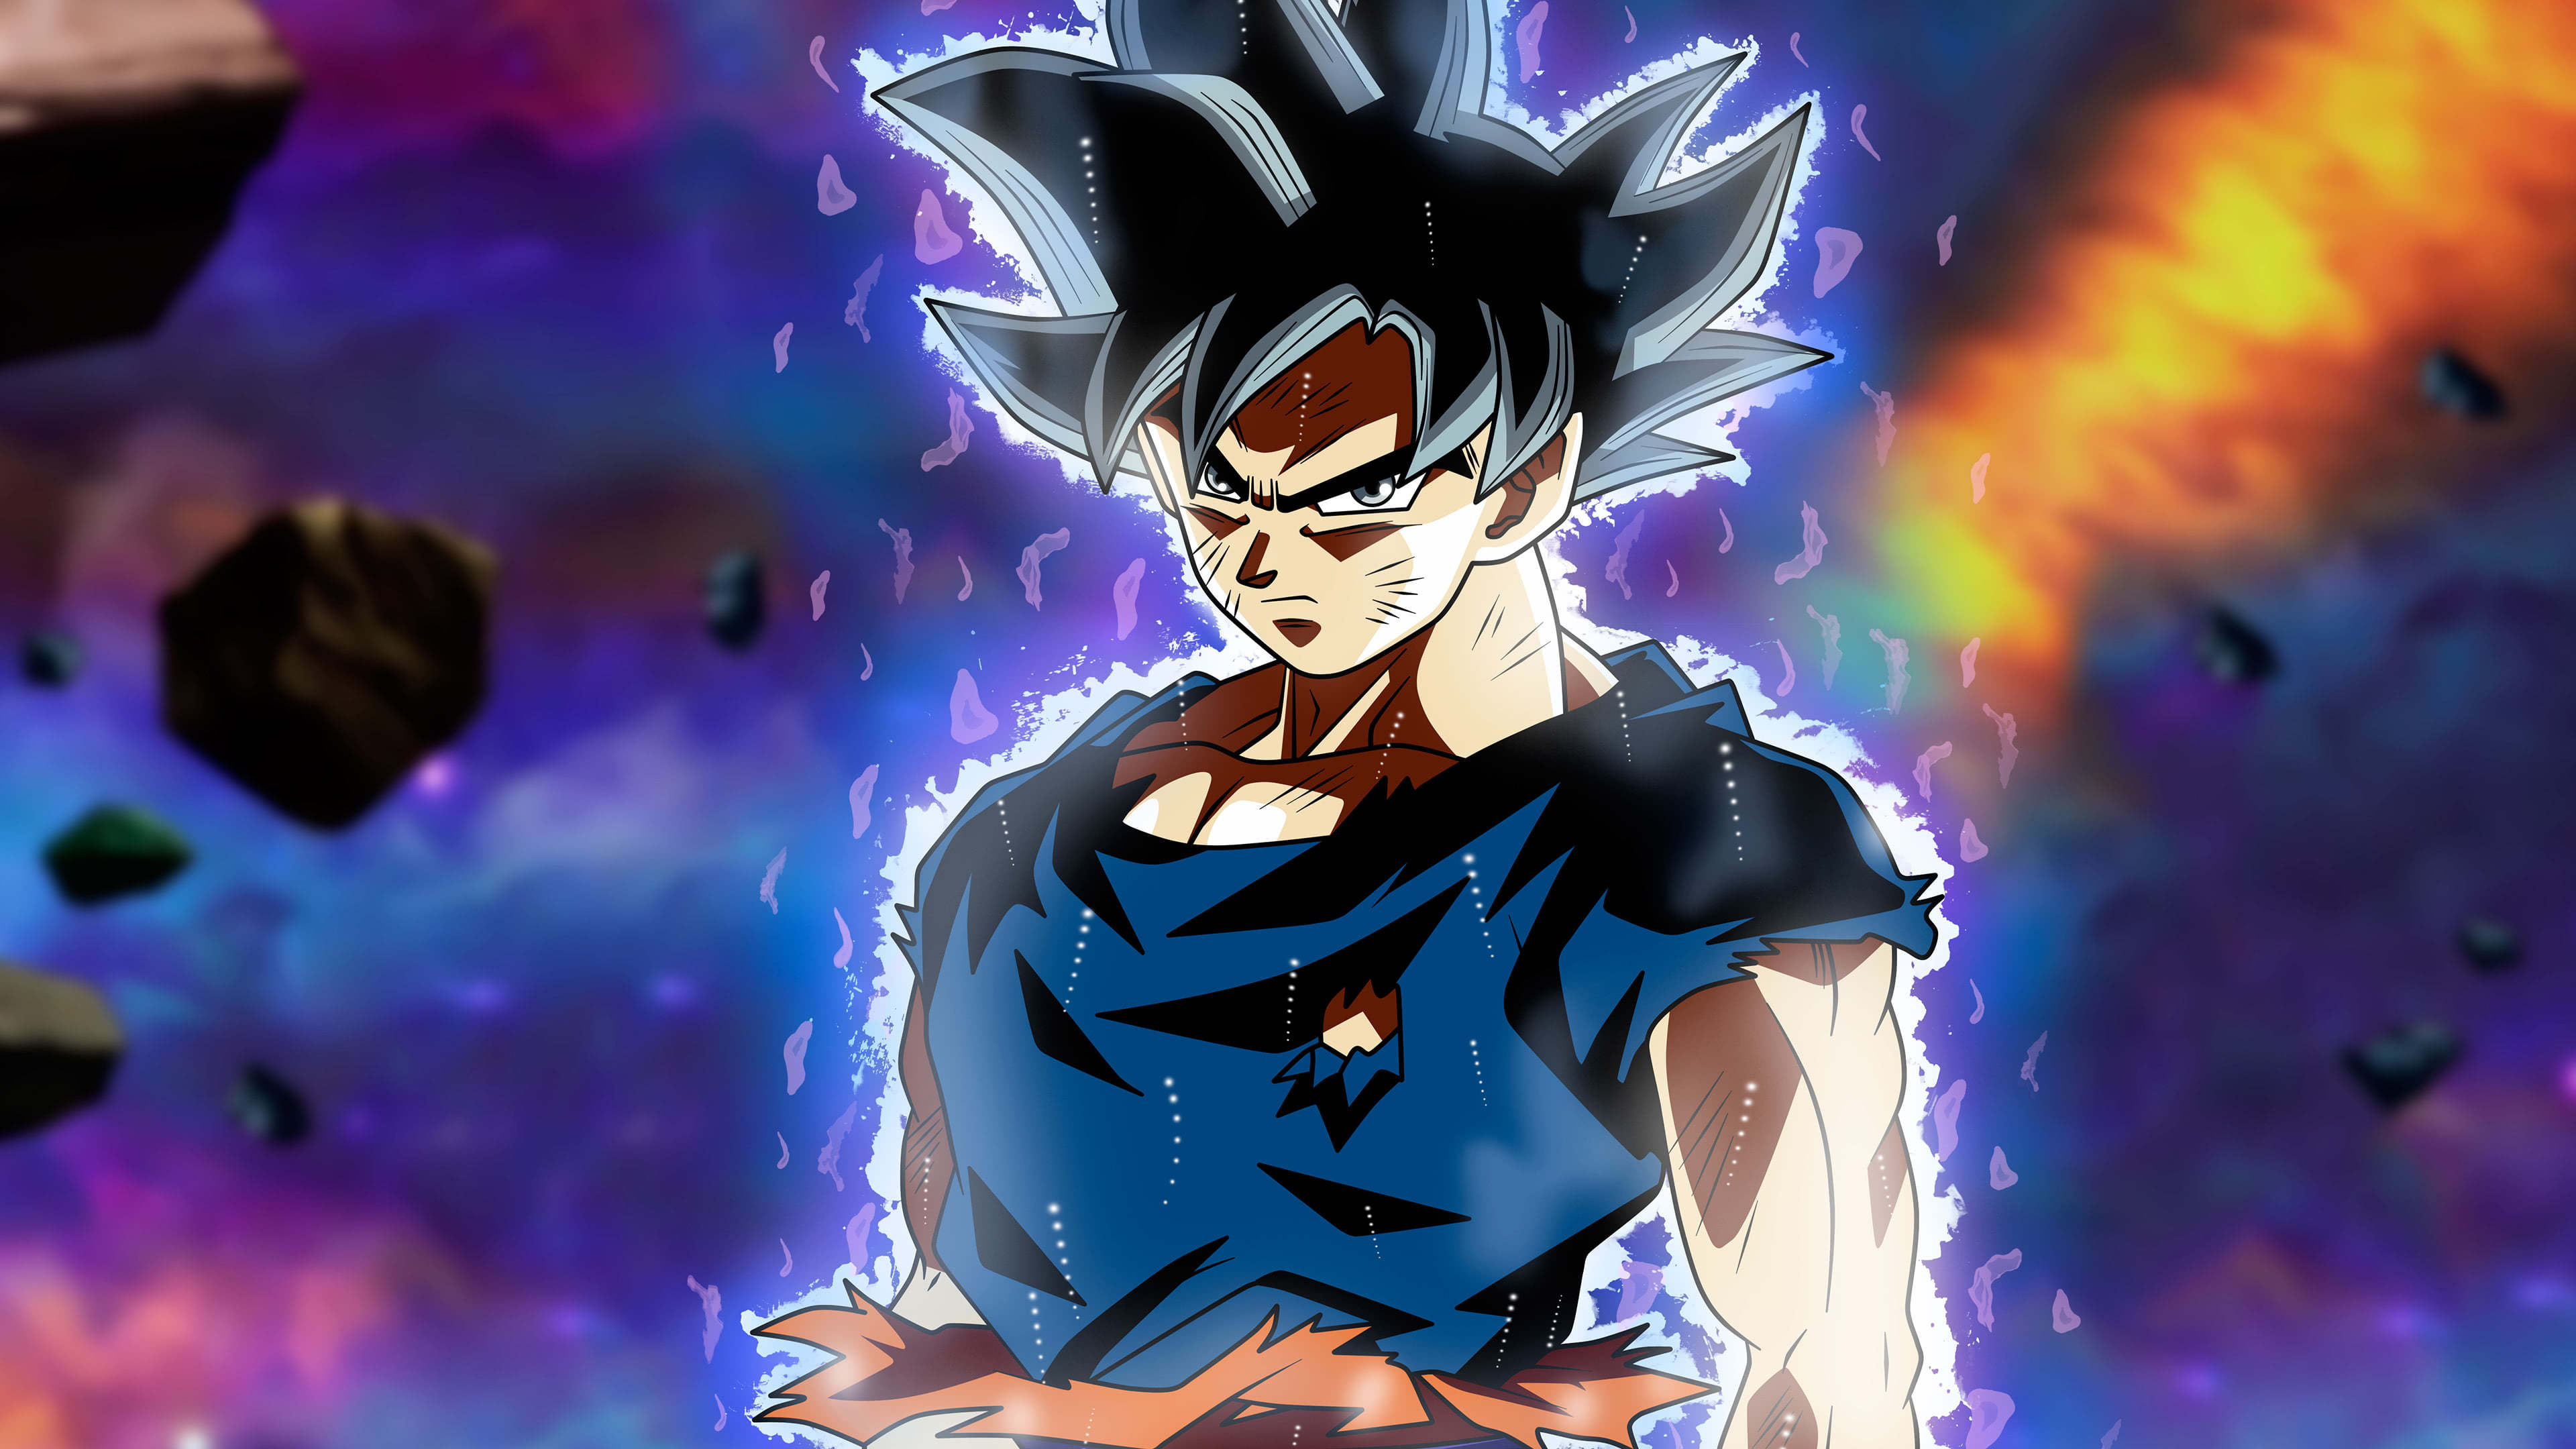 Dragon Ball Super Ultra Instinct Goku Portrait Uhd 4k Wallpaper